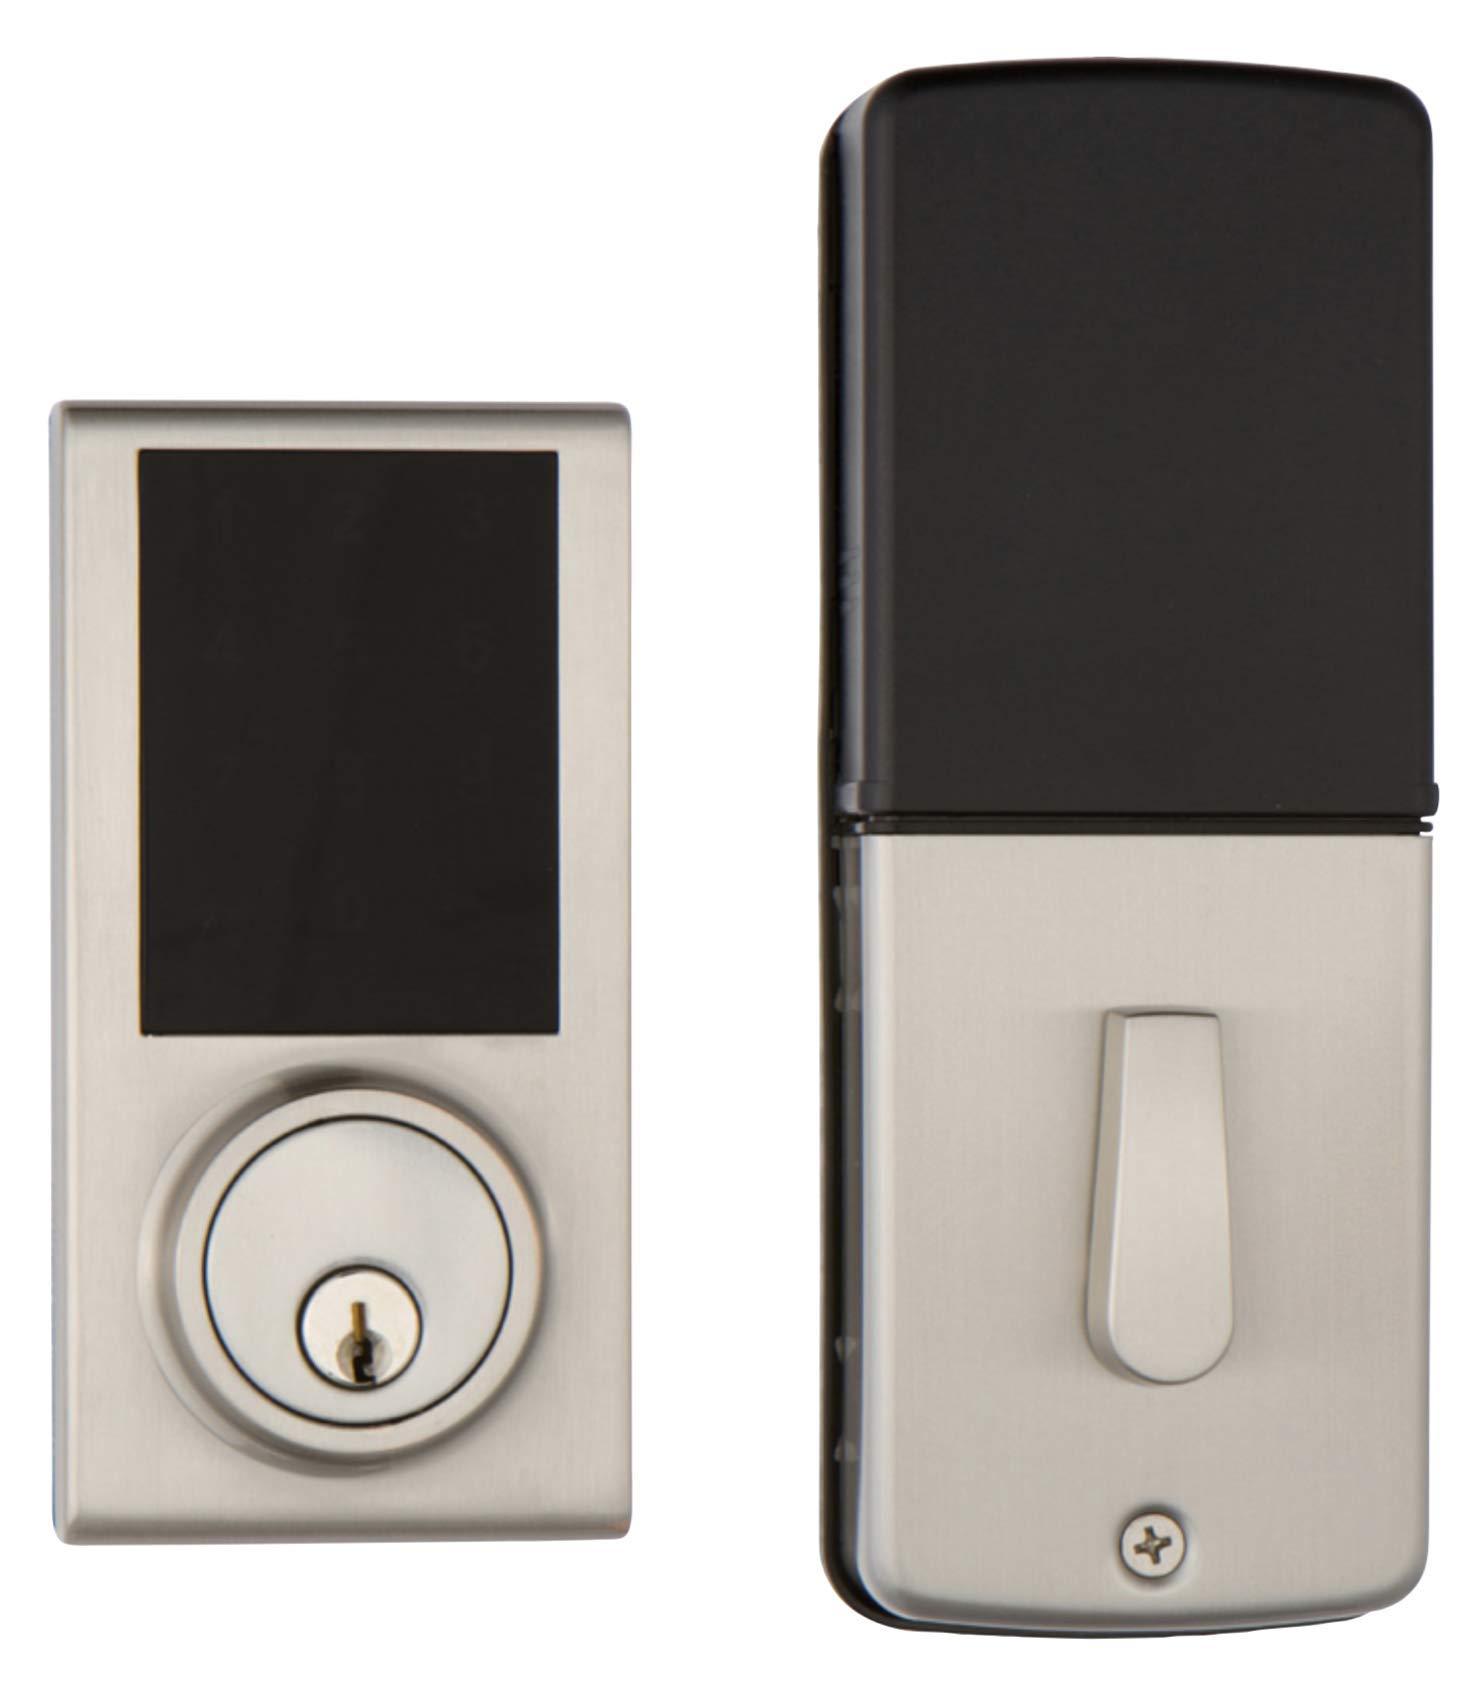 Delaney Hardware 301771, Satin Nickel Z-Wave Smart TOUCHPAD US15 Deadbolt Lock, by Delaney Hardware (Image #2)